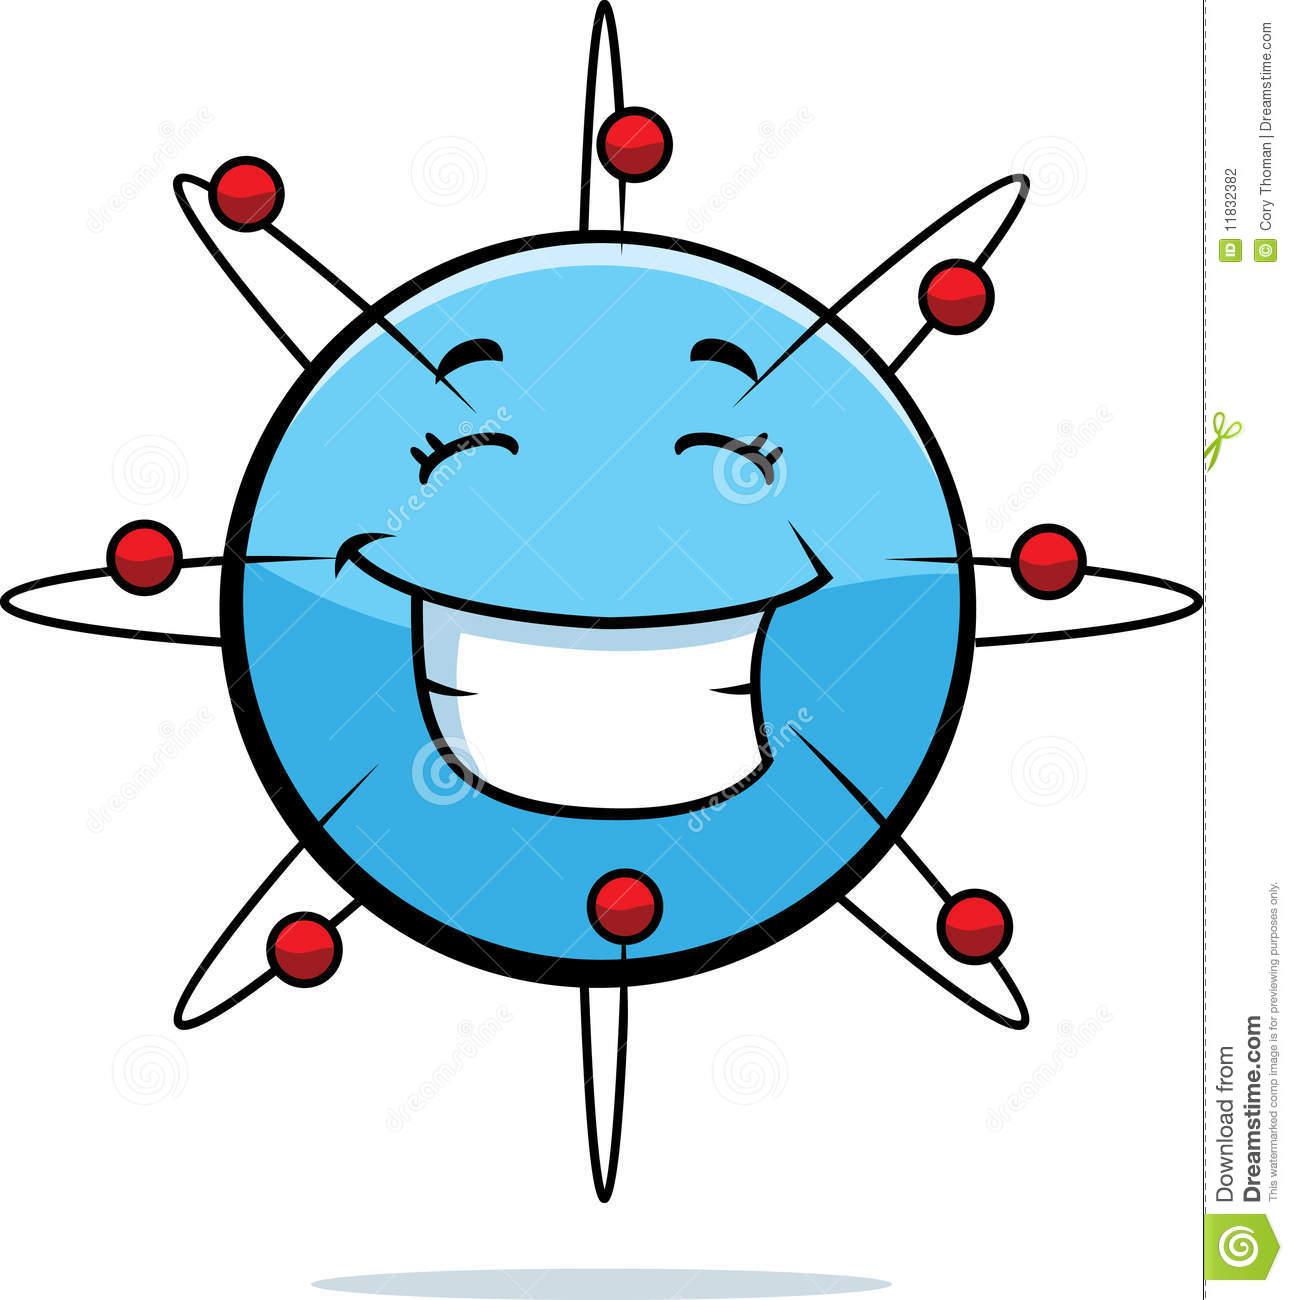 Atom Smiling Stock Photography.